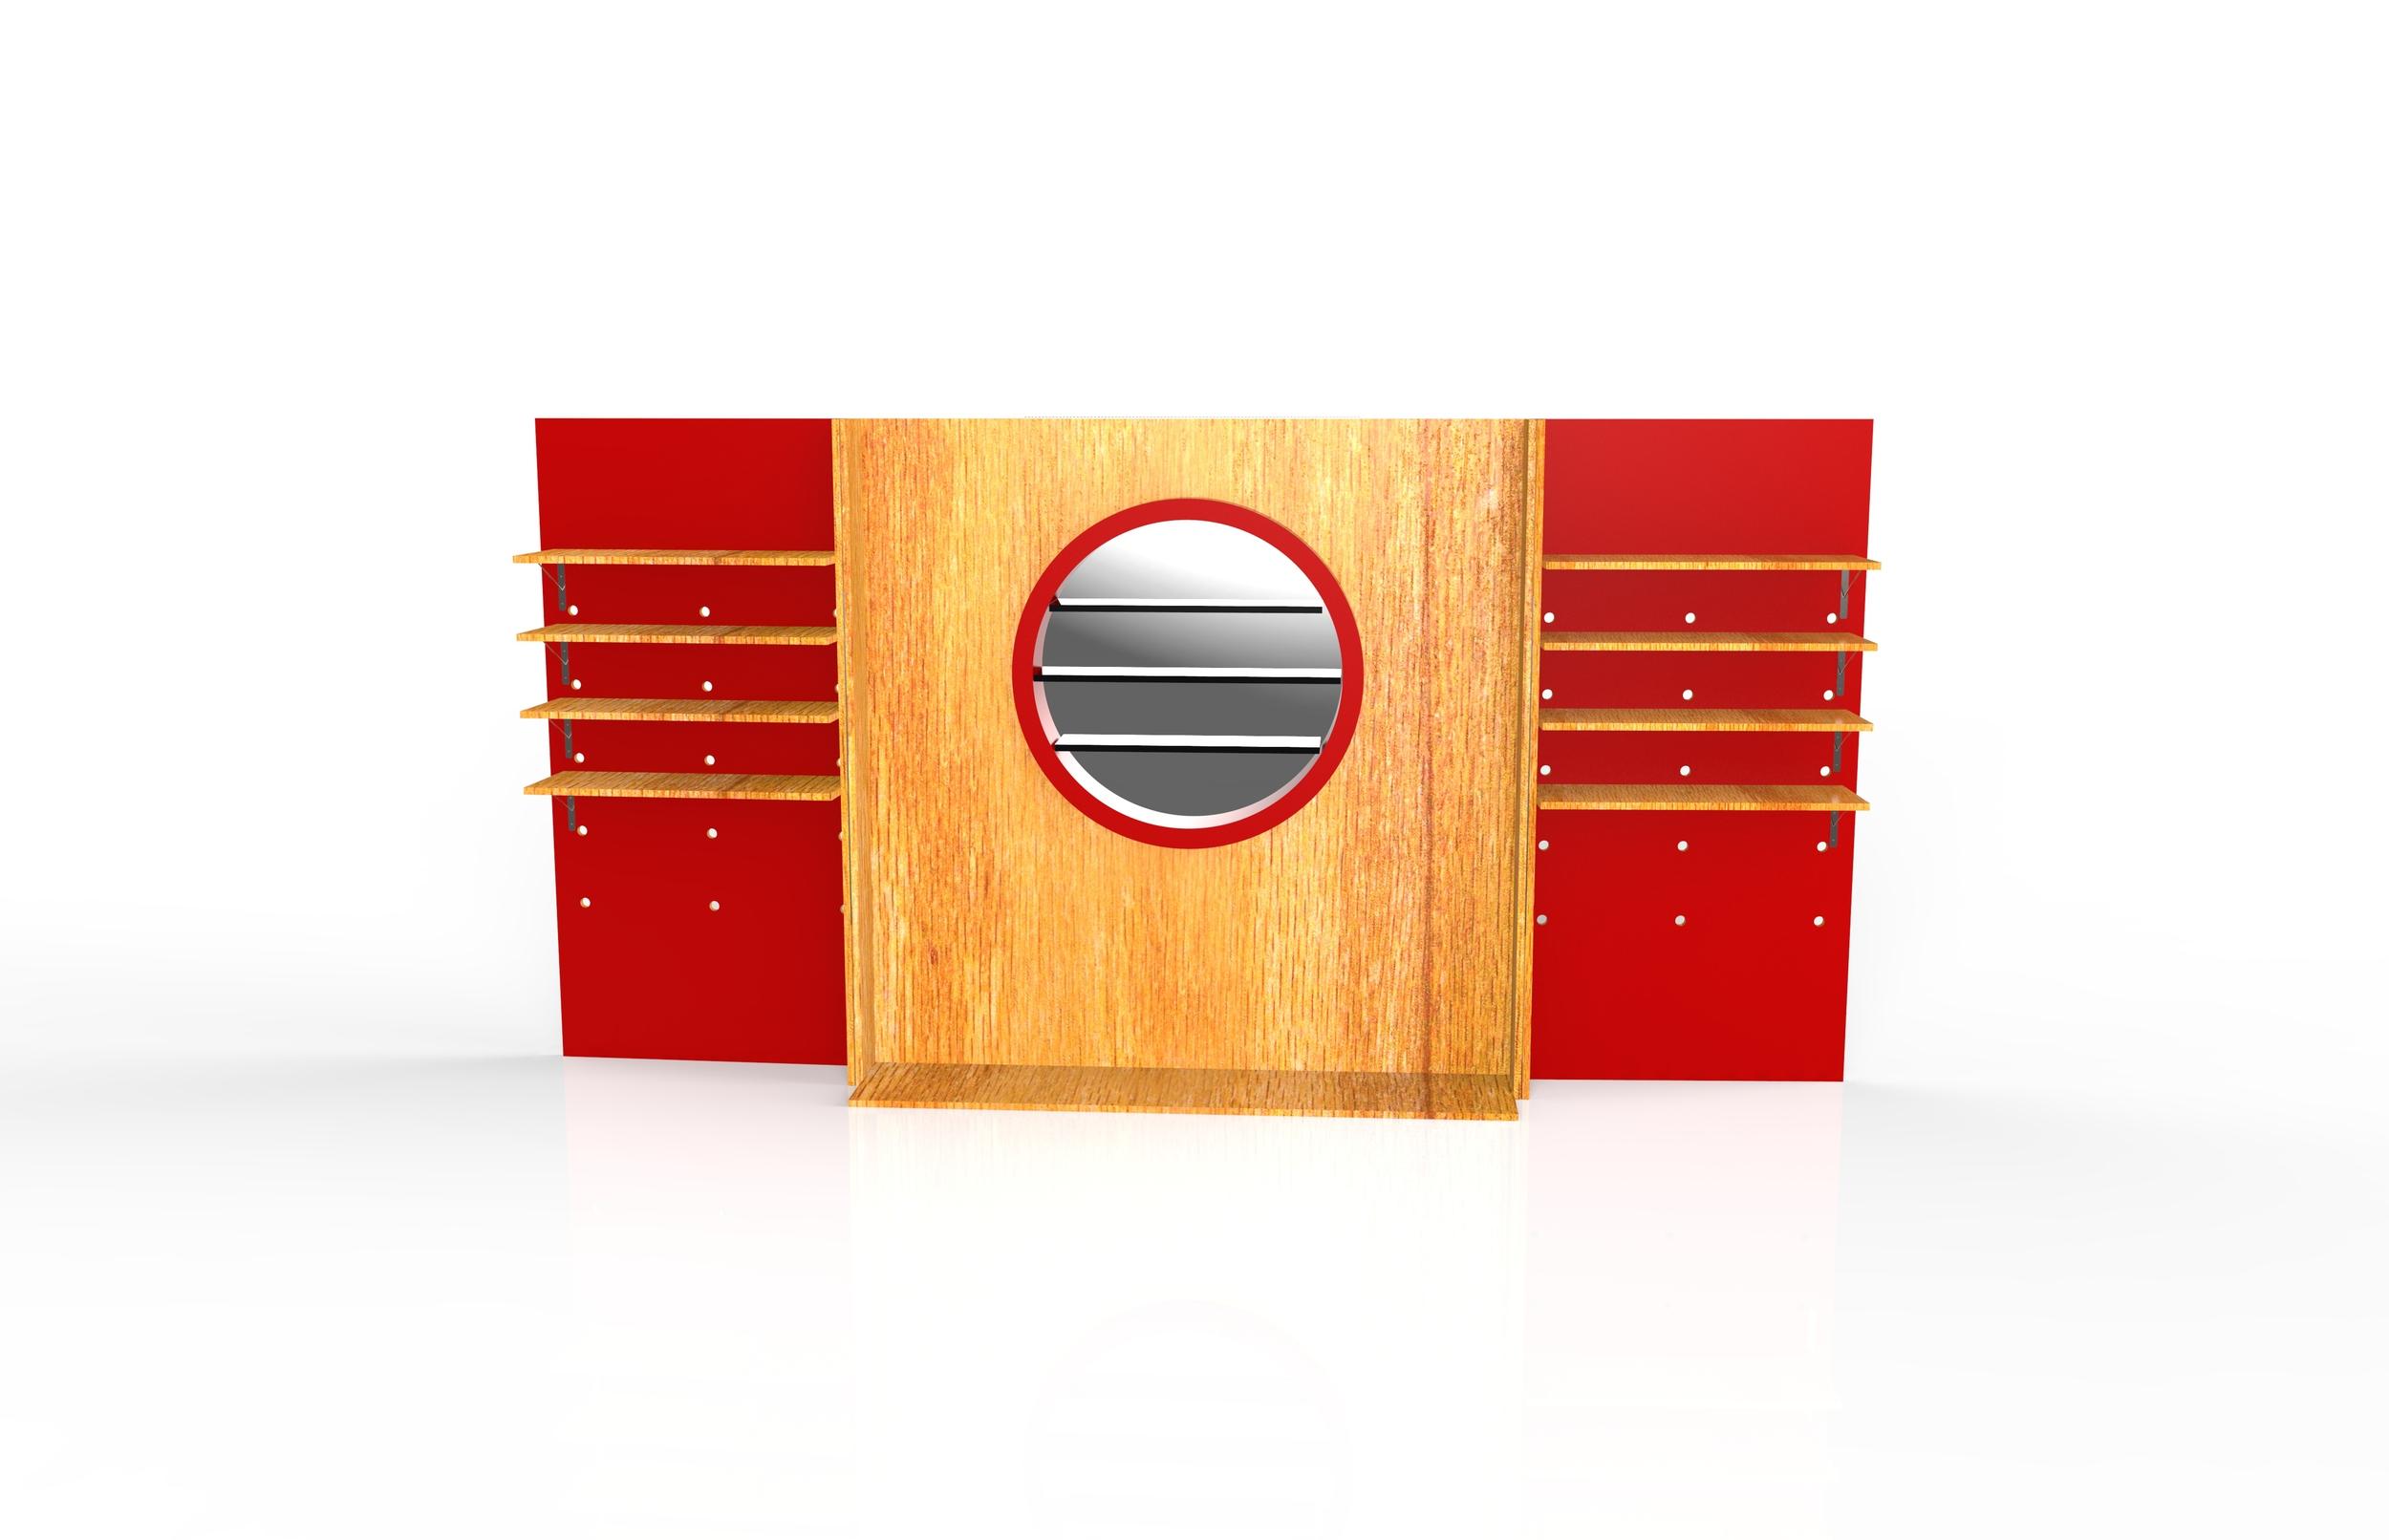 Crate2.240.jpg